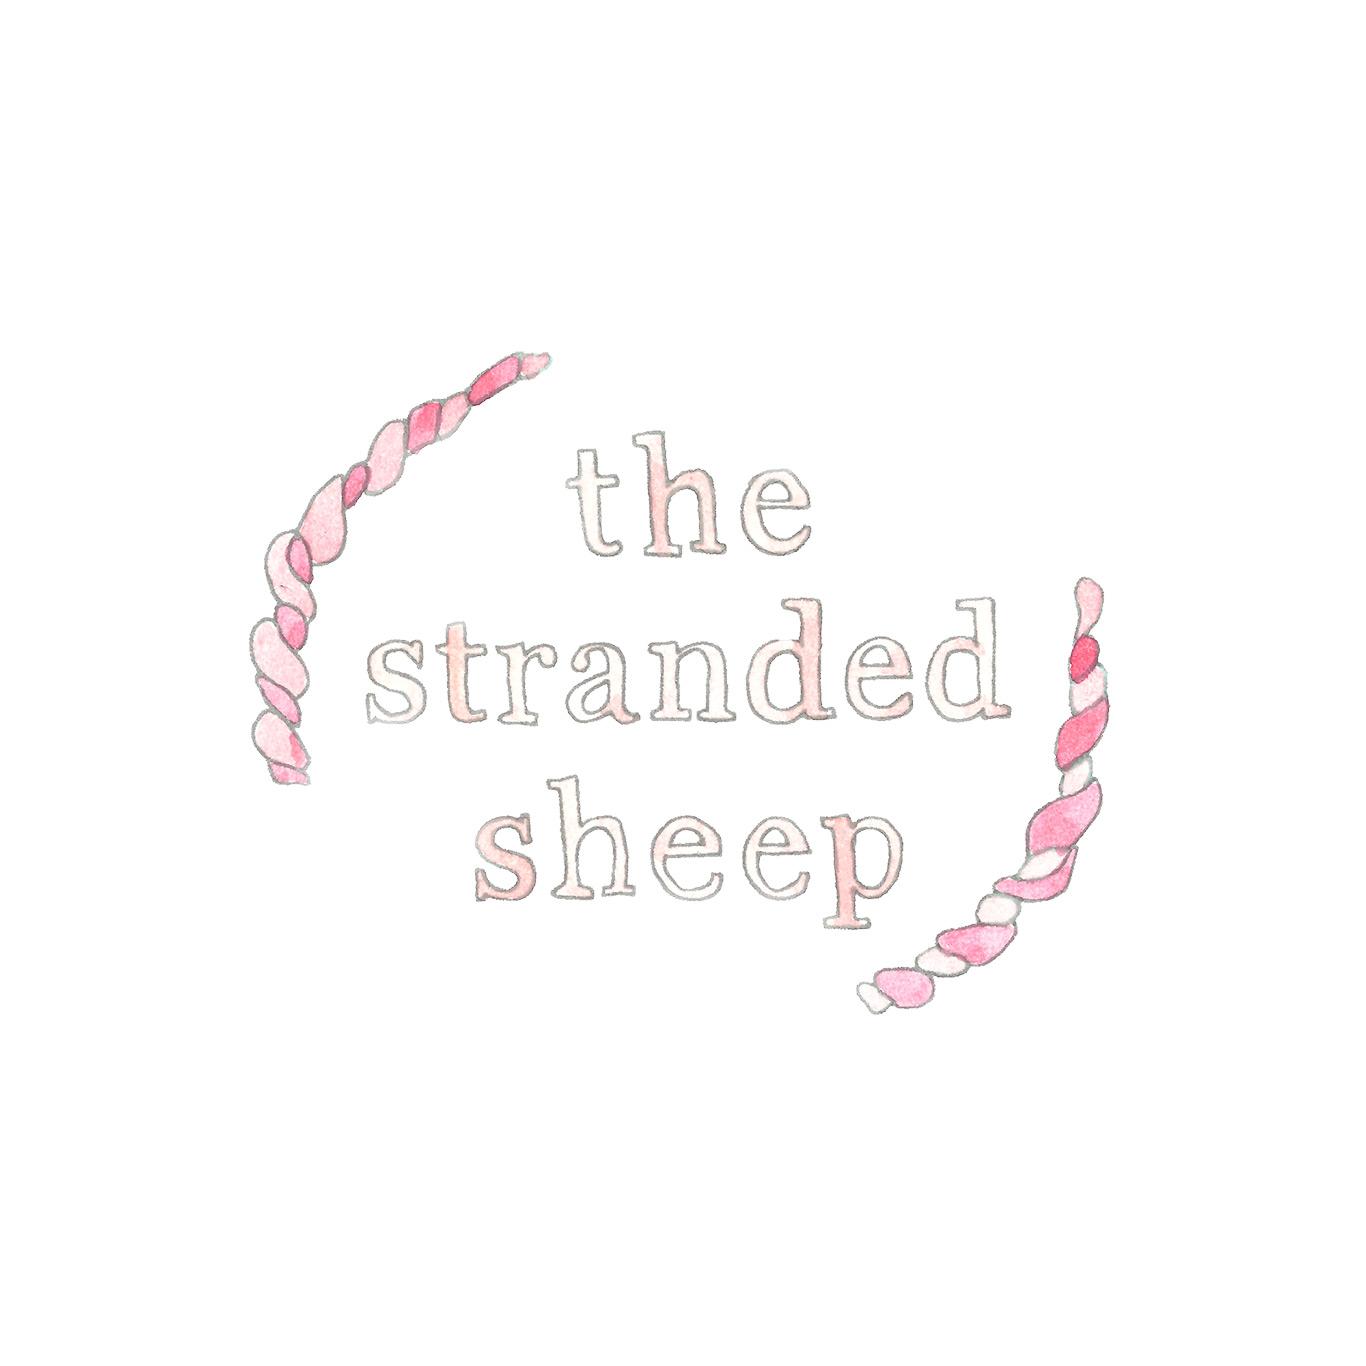 stranded-sheep-case-study-logo.jpg